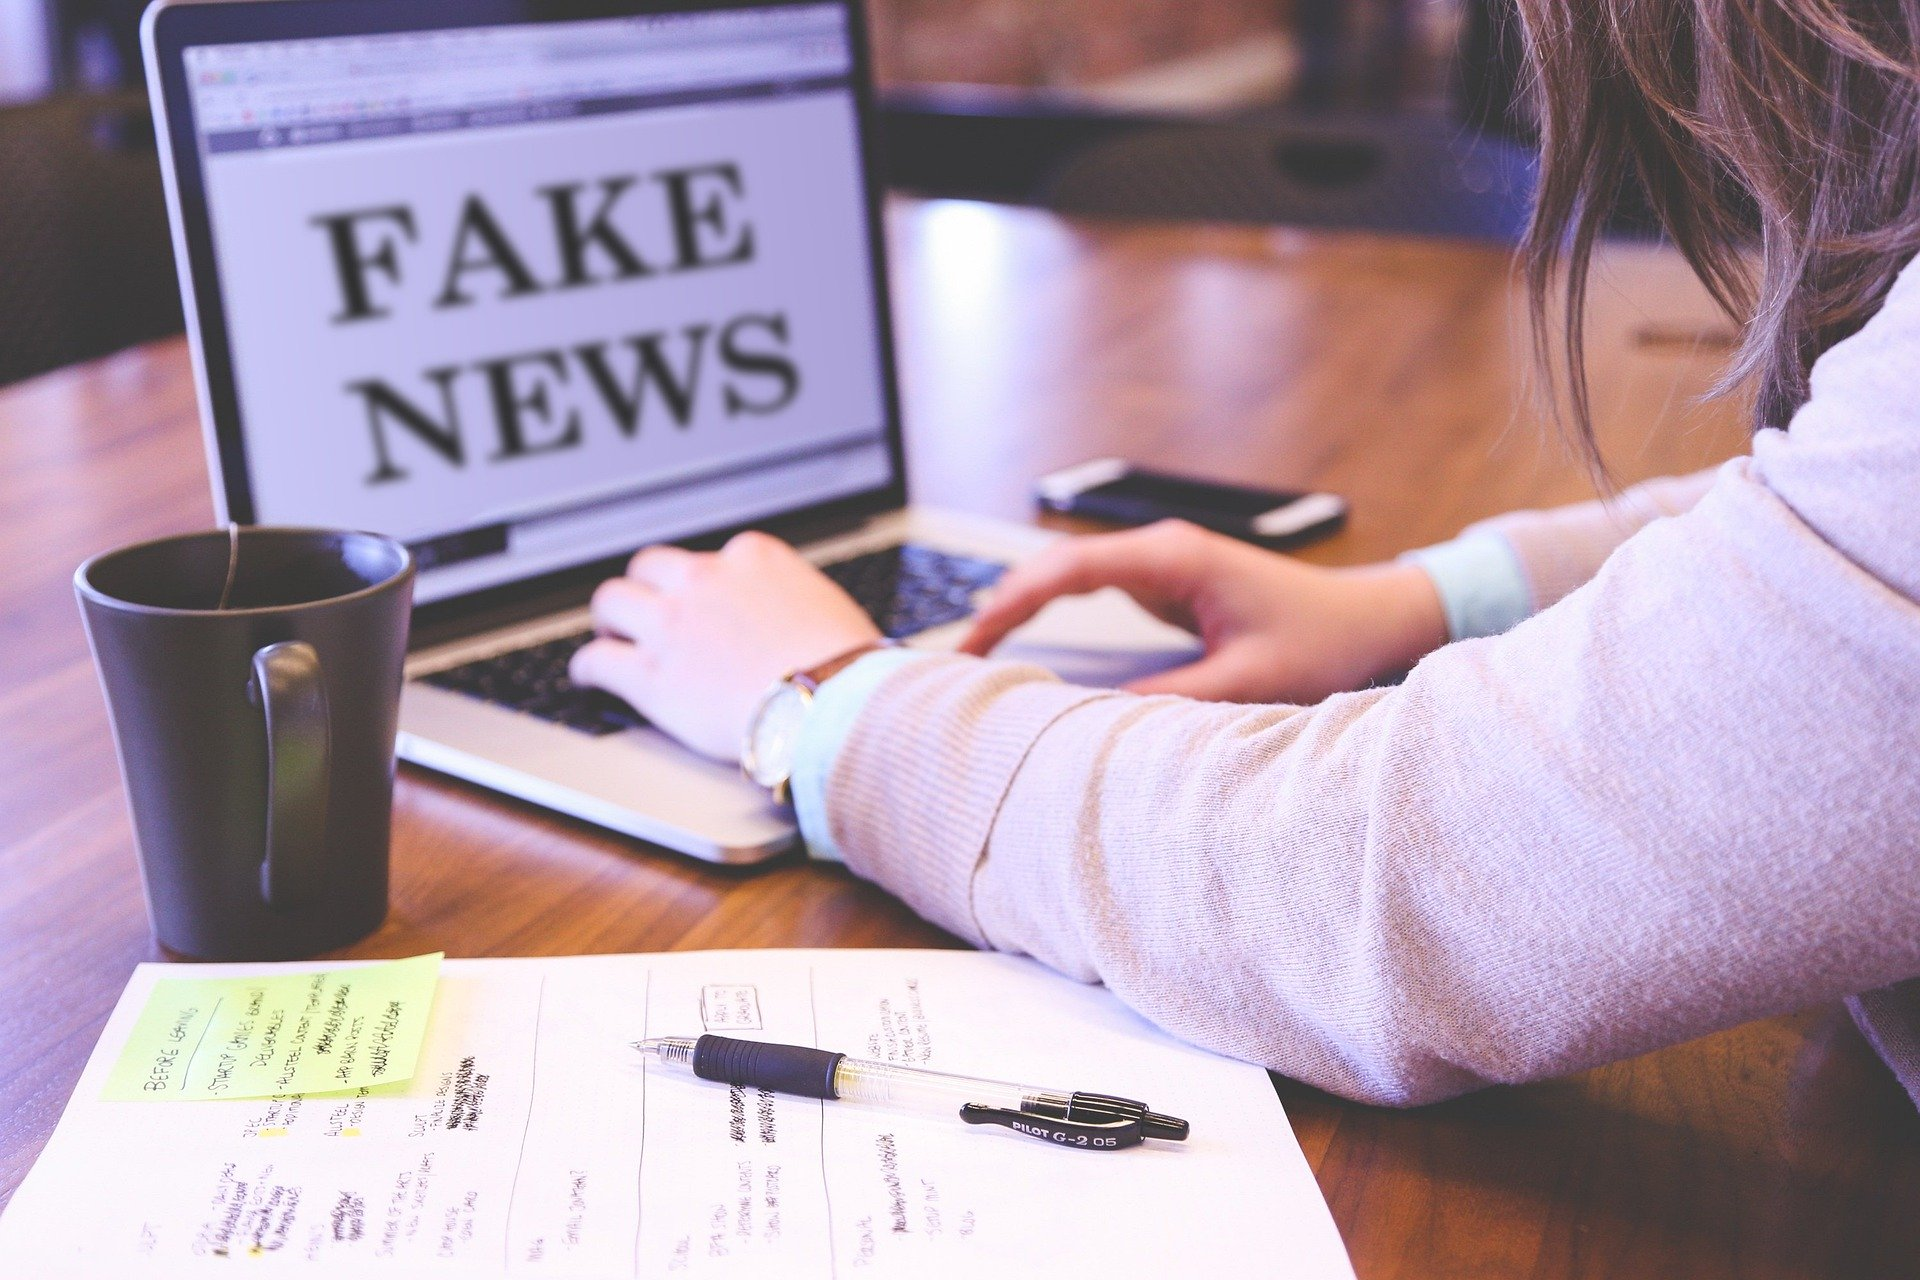 fake news 4881488 1920